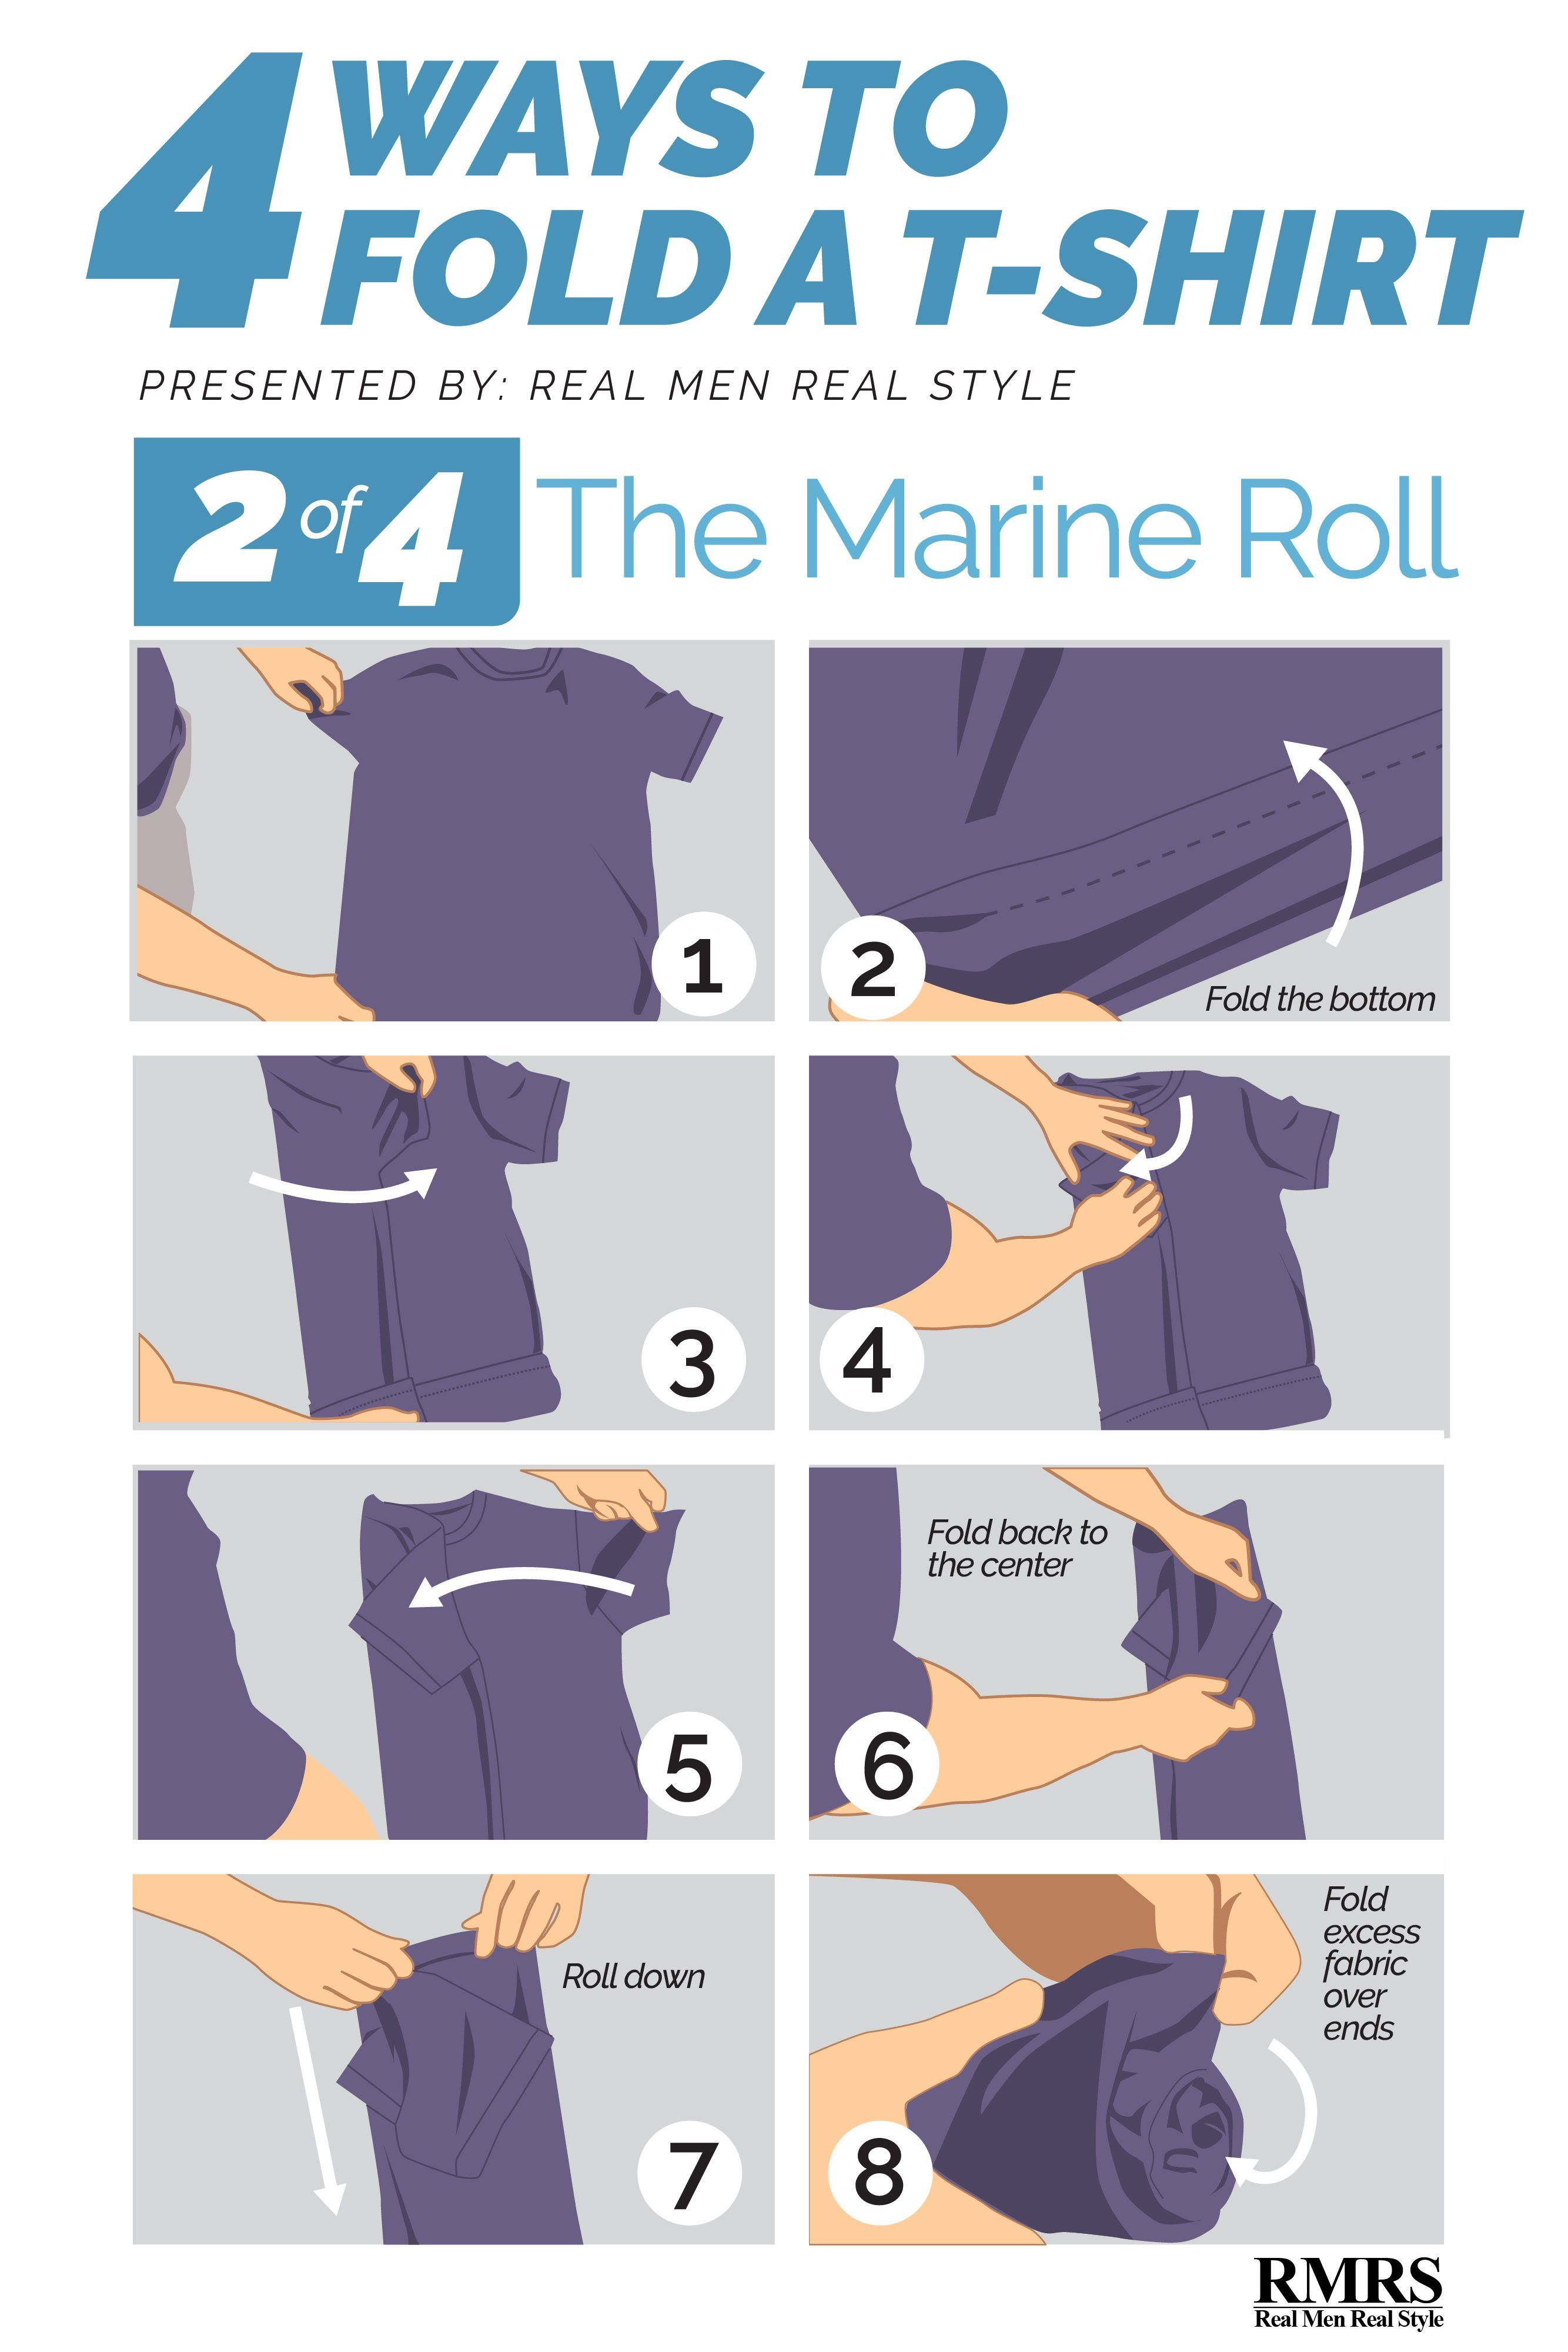 Folding tshirts marine roll this roll takes up very